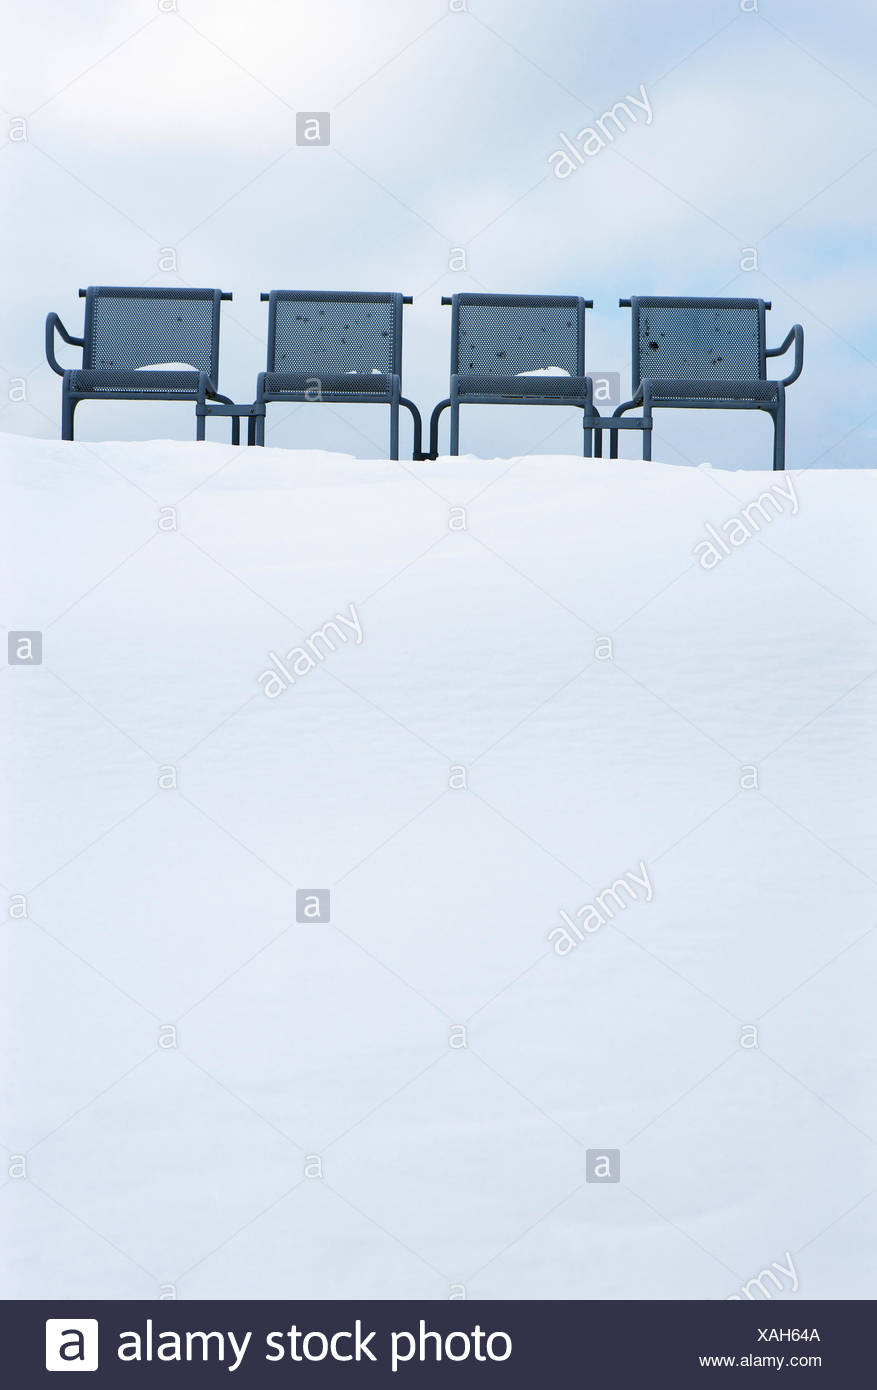 Empty row of seats in snow - Stock Image